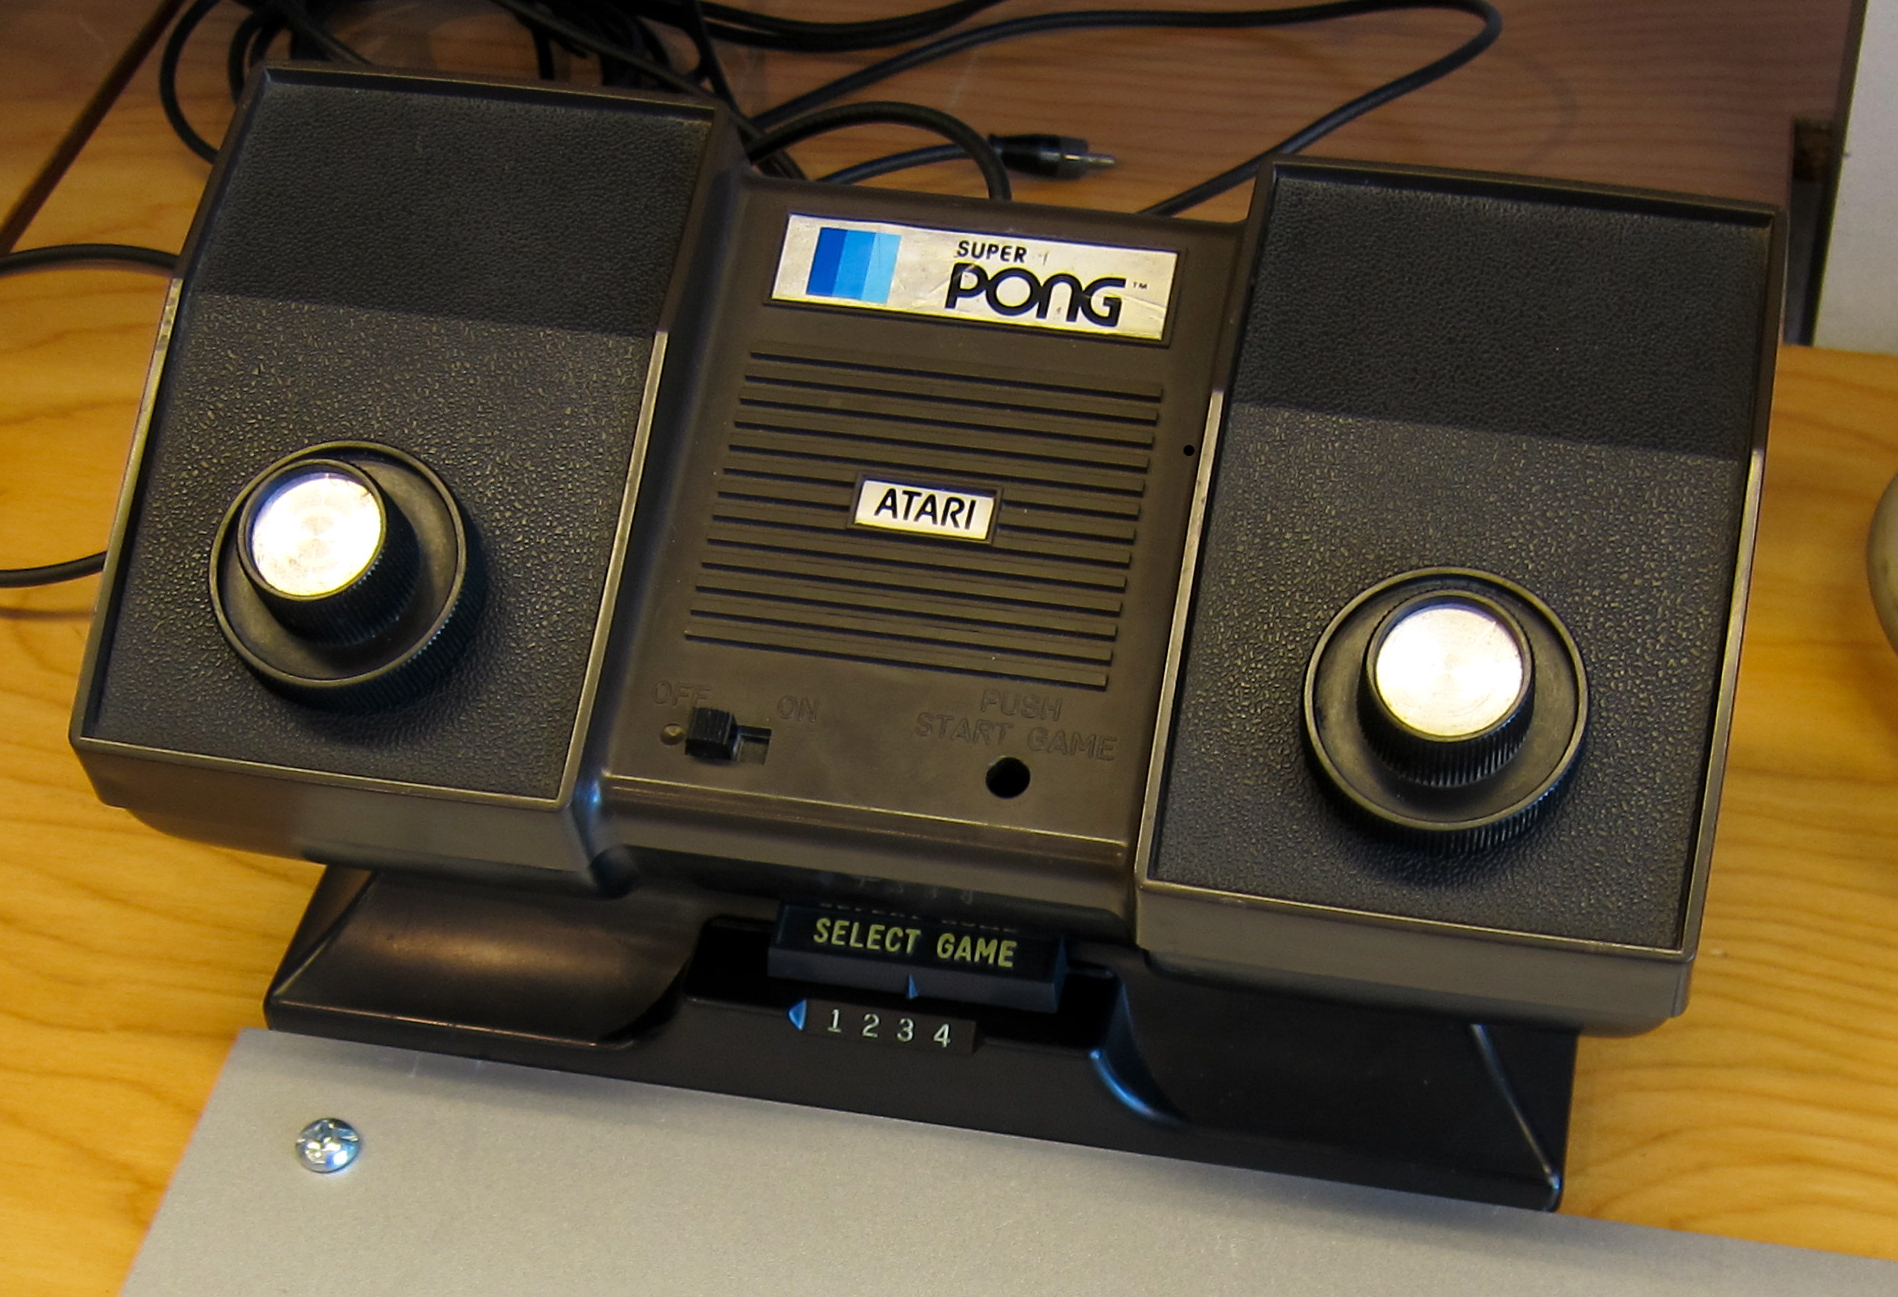 console Atari Super Pong